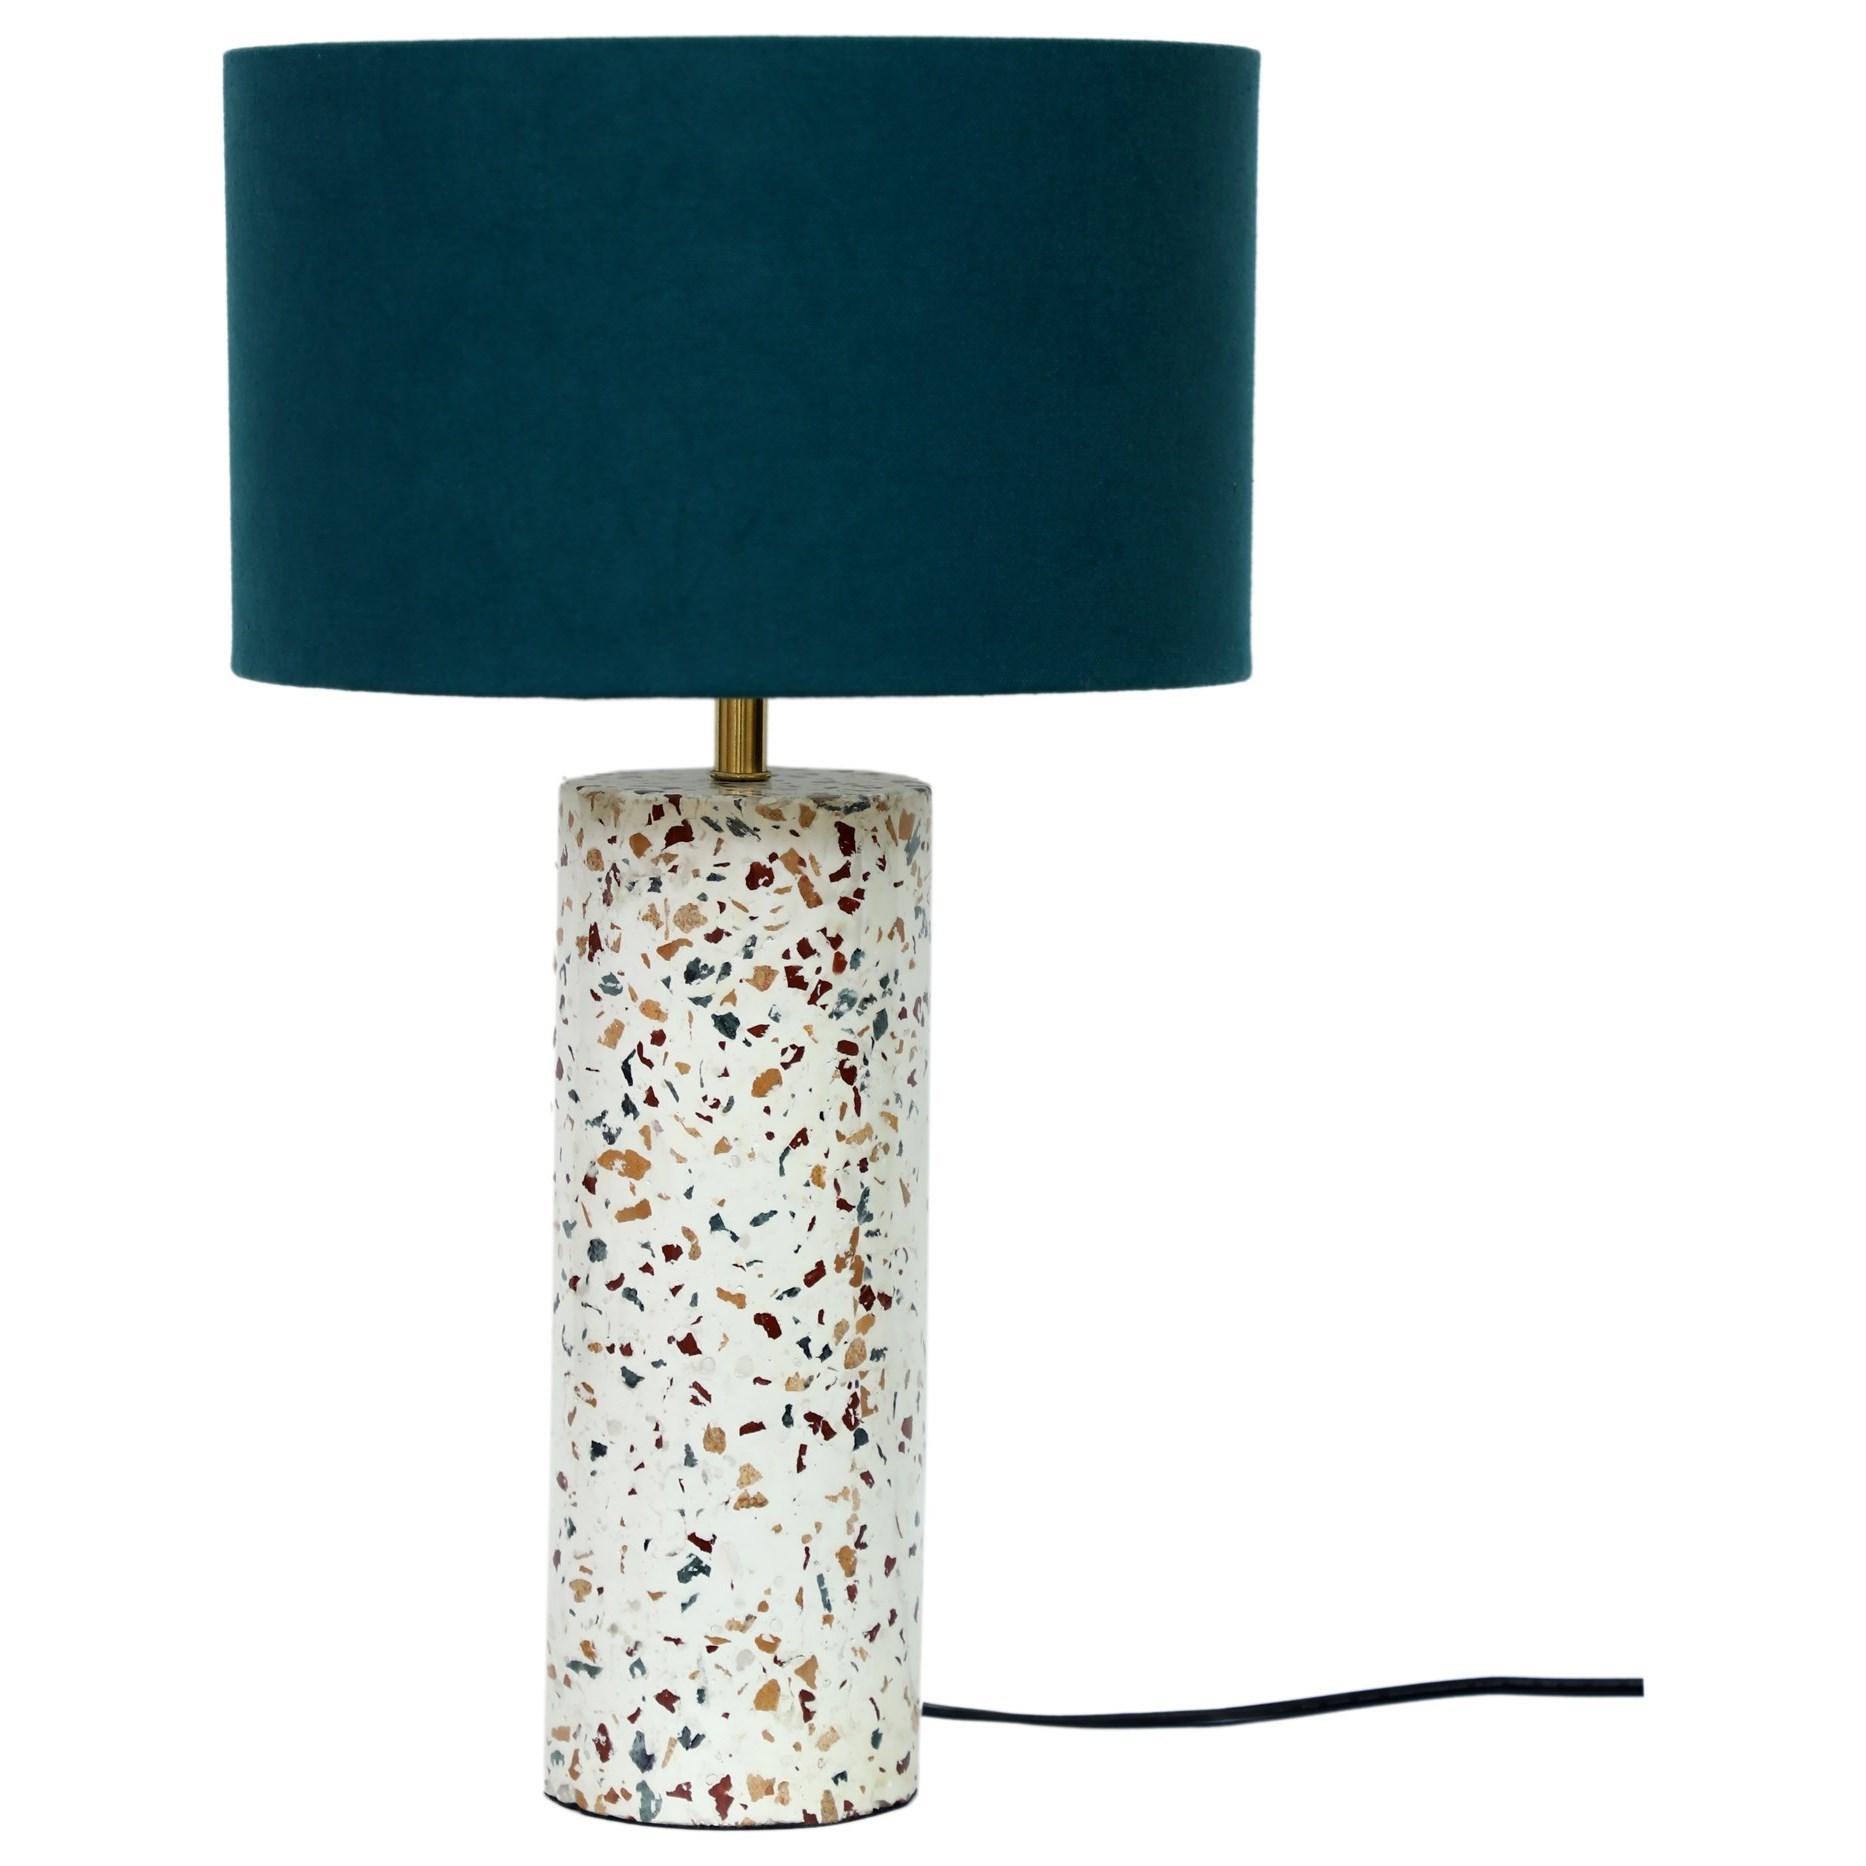 Lighting Terrazzo Cylinder Table Lamp at Sadler's Home Furnishings